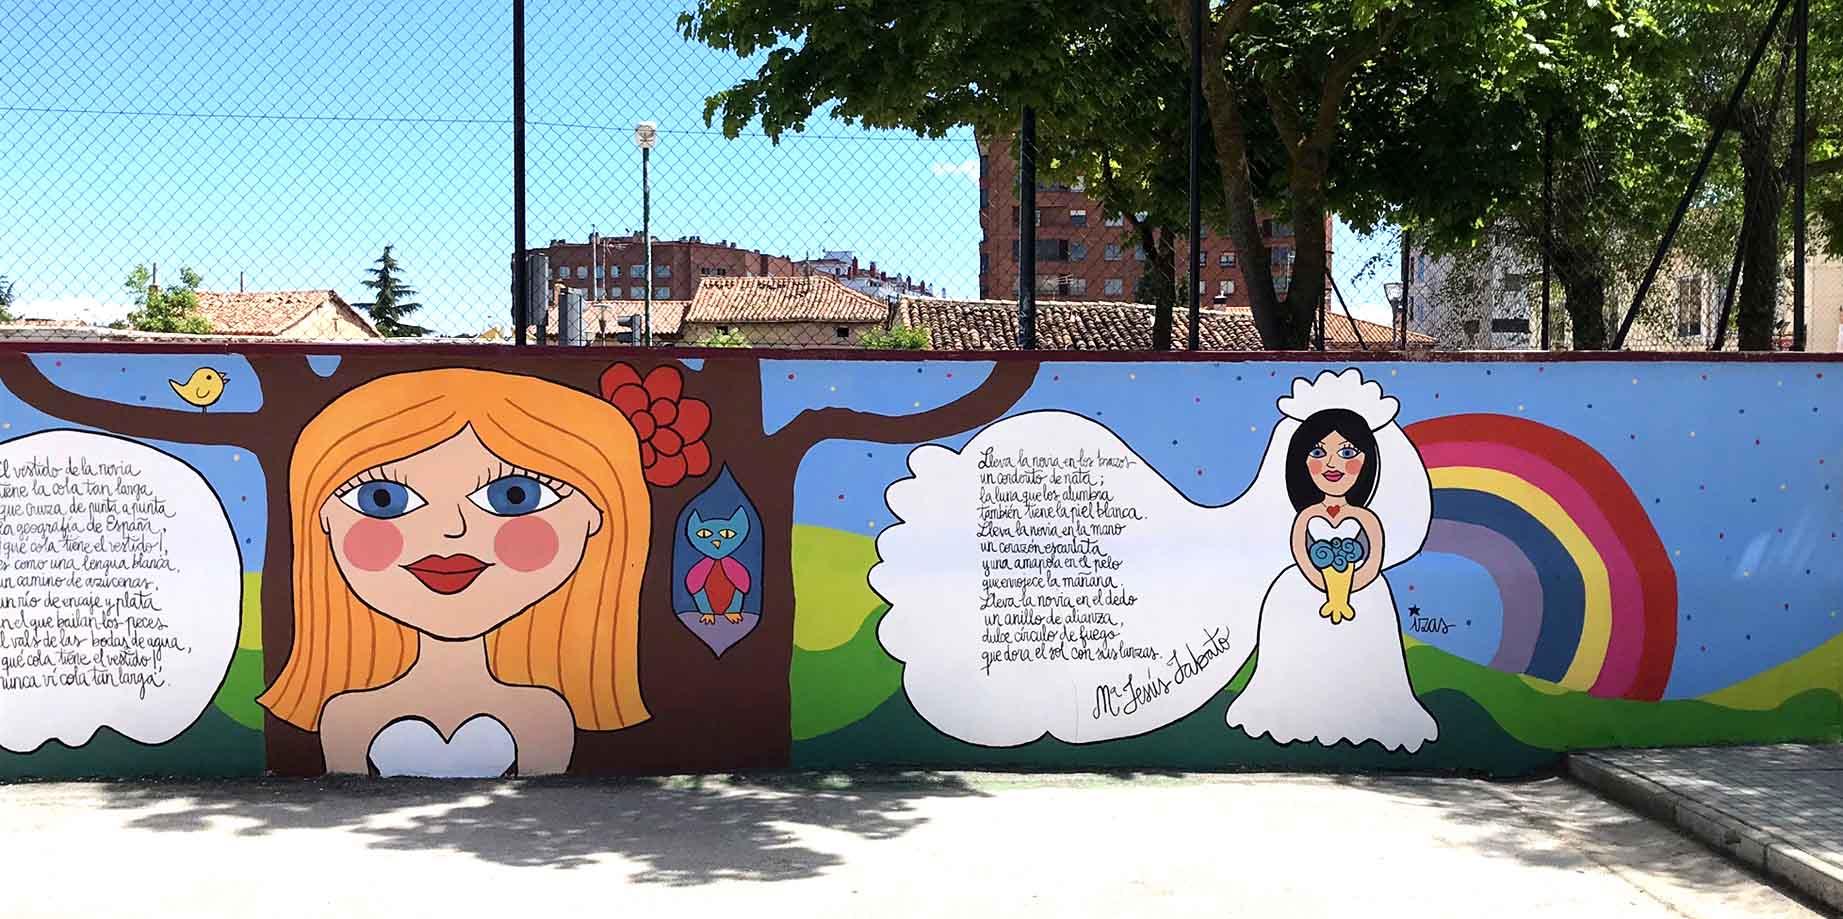 mural izas dibujando la palabra burgos 6